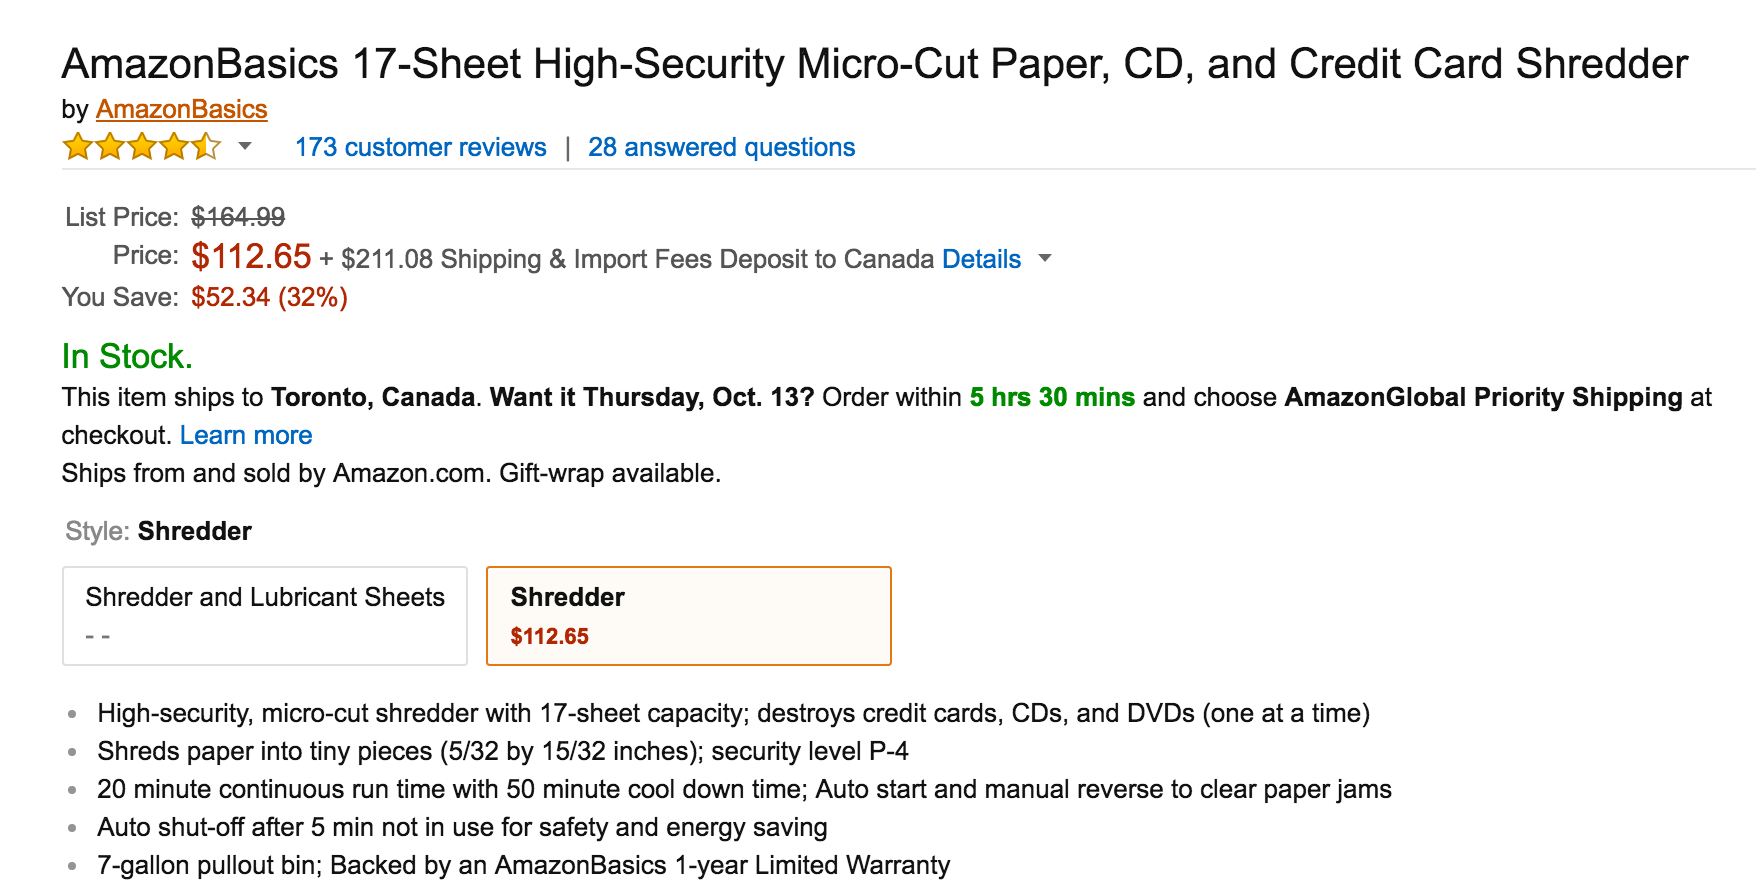 amazonbasics-17-sheet-high-security-micro-cut-paper-cd-and-credit-card-shredder-2